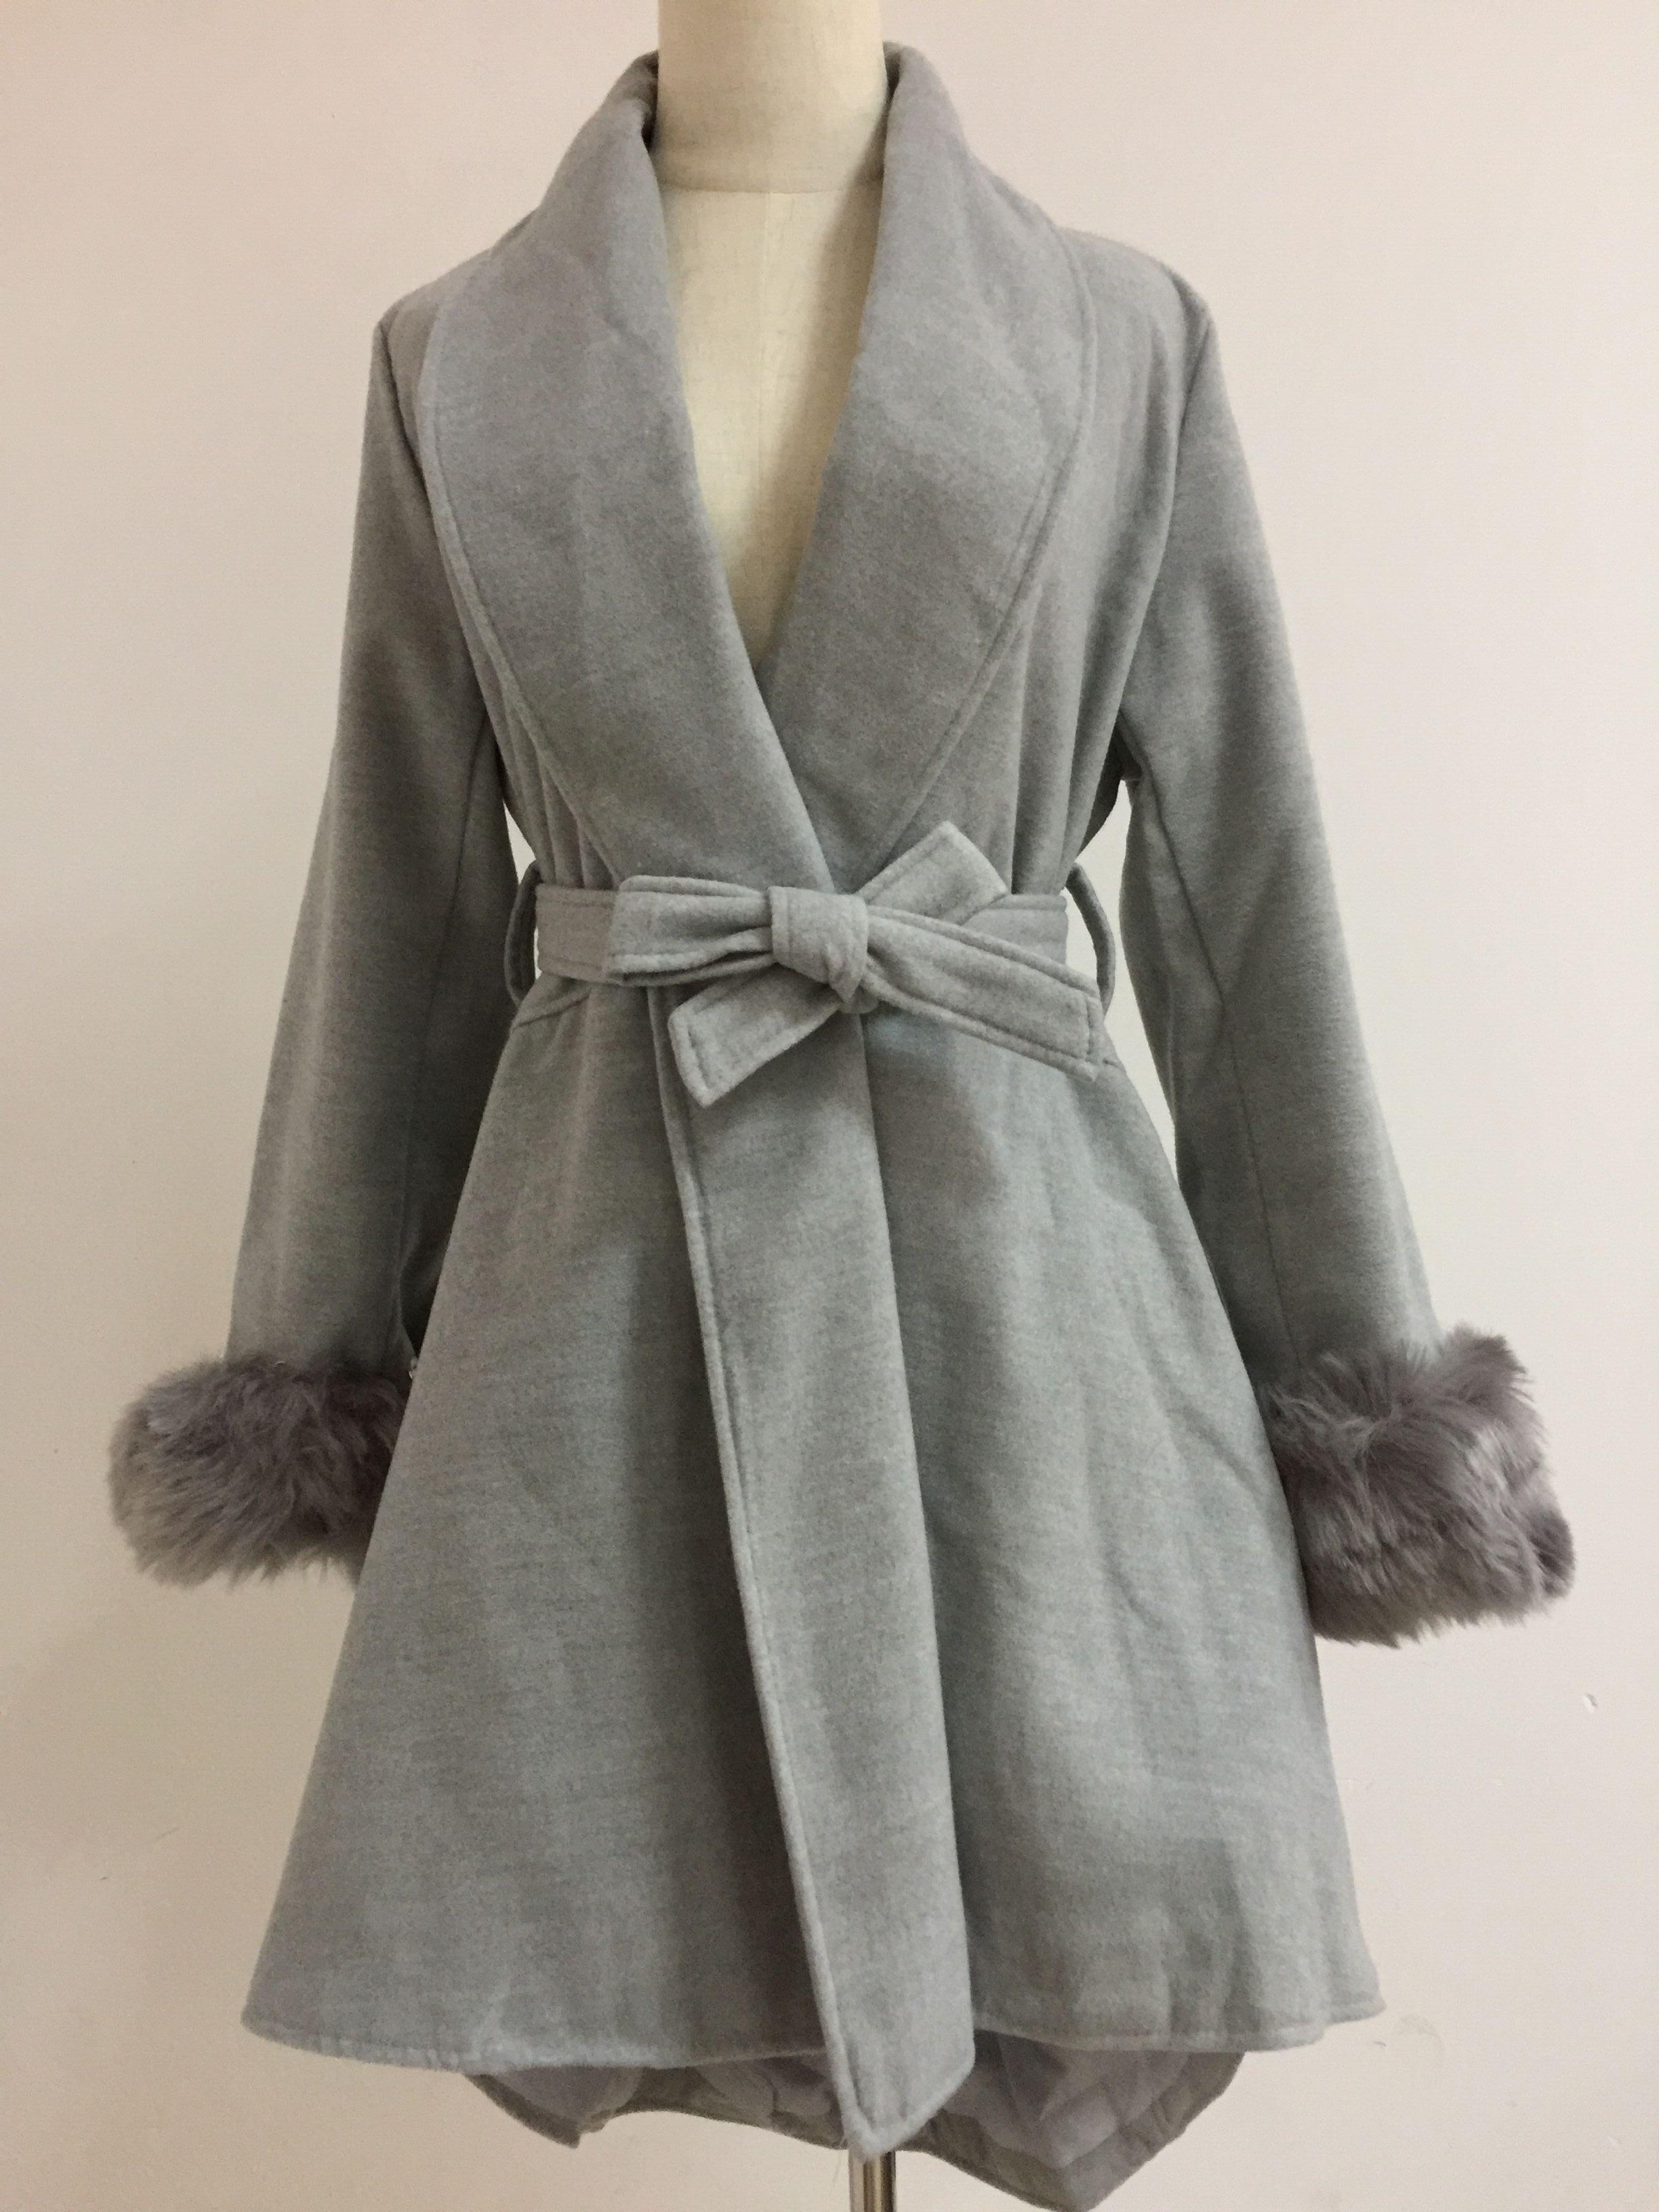 08669ac34b8 0 0 Plus Size 4XL Elegant Slim Women Long Wool Blend Coat Solid Faux Fur  Collar Detachable Jacket Autumn Winter Office Lady Coats-in Wool   Blends  from ...